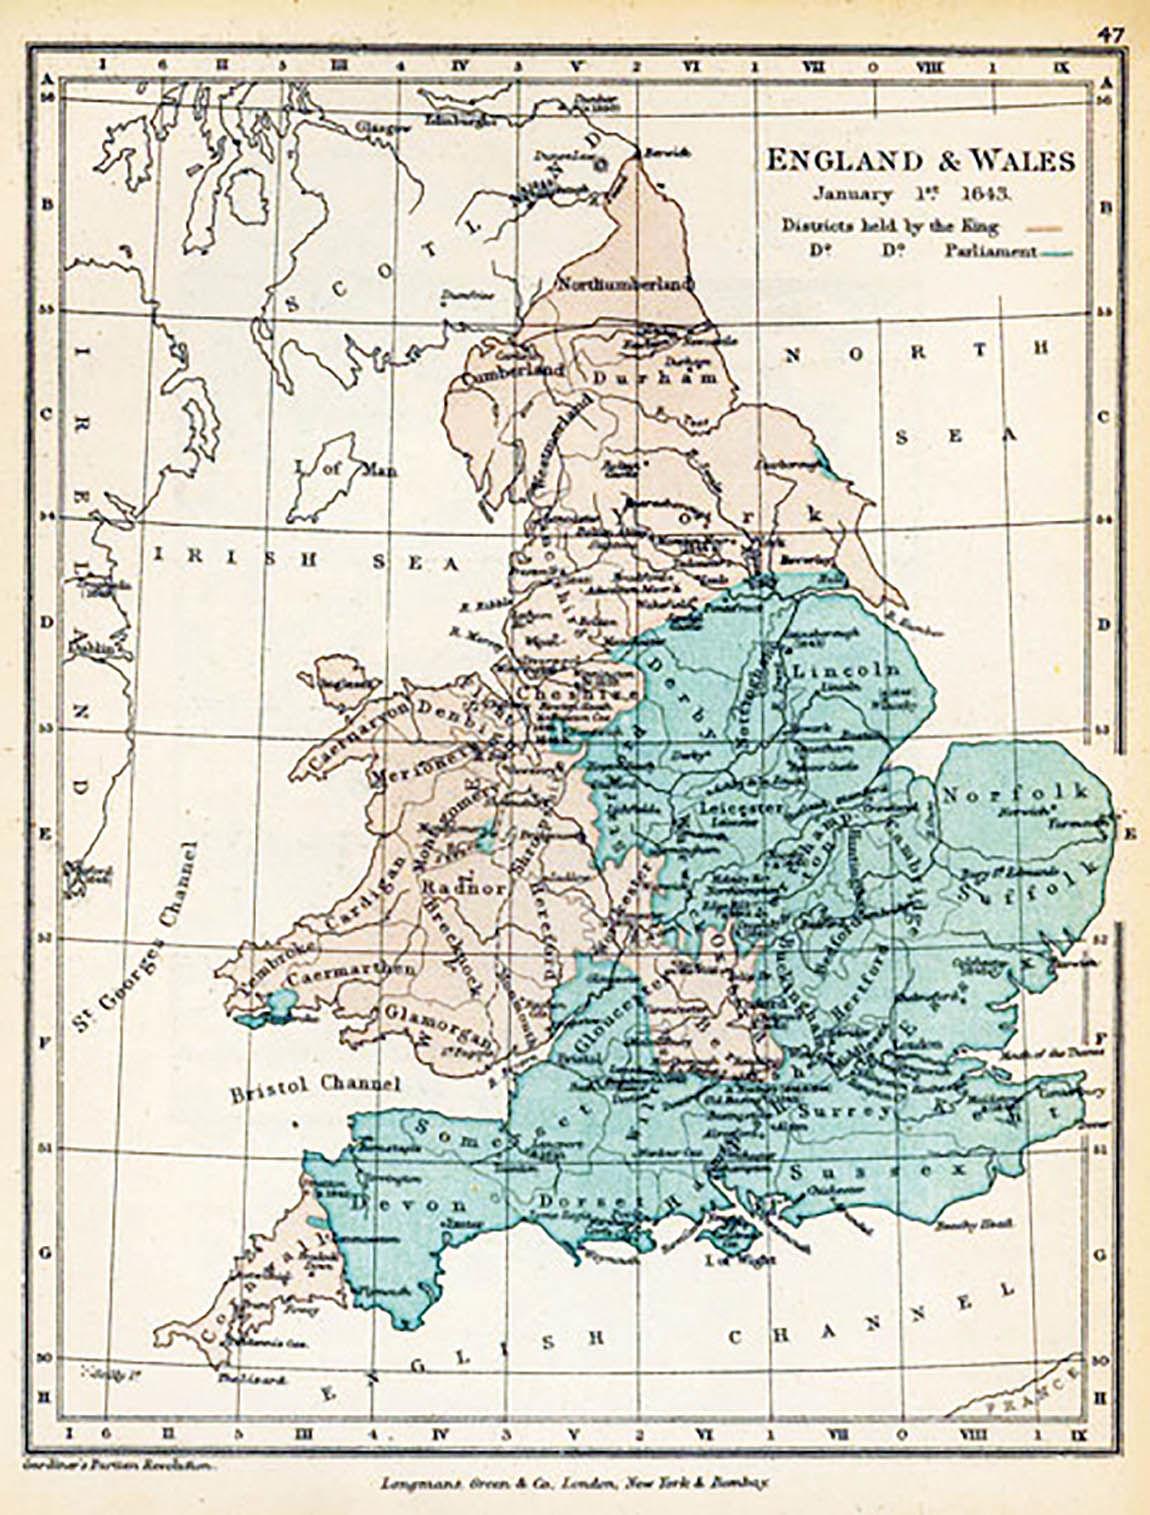 الحاق اسکاتلند به انگلستان